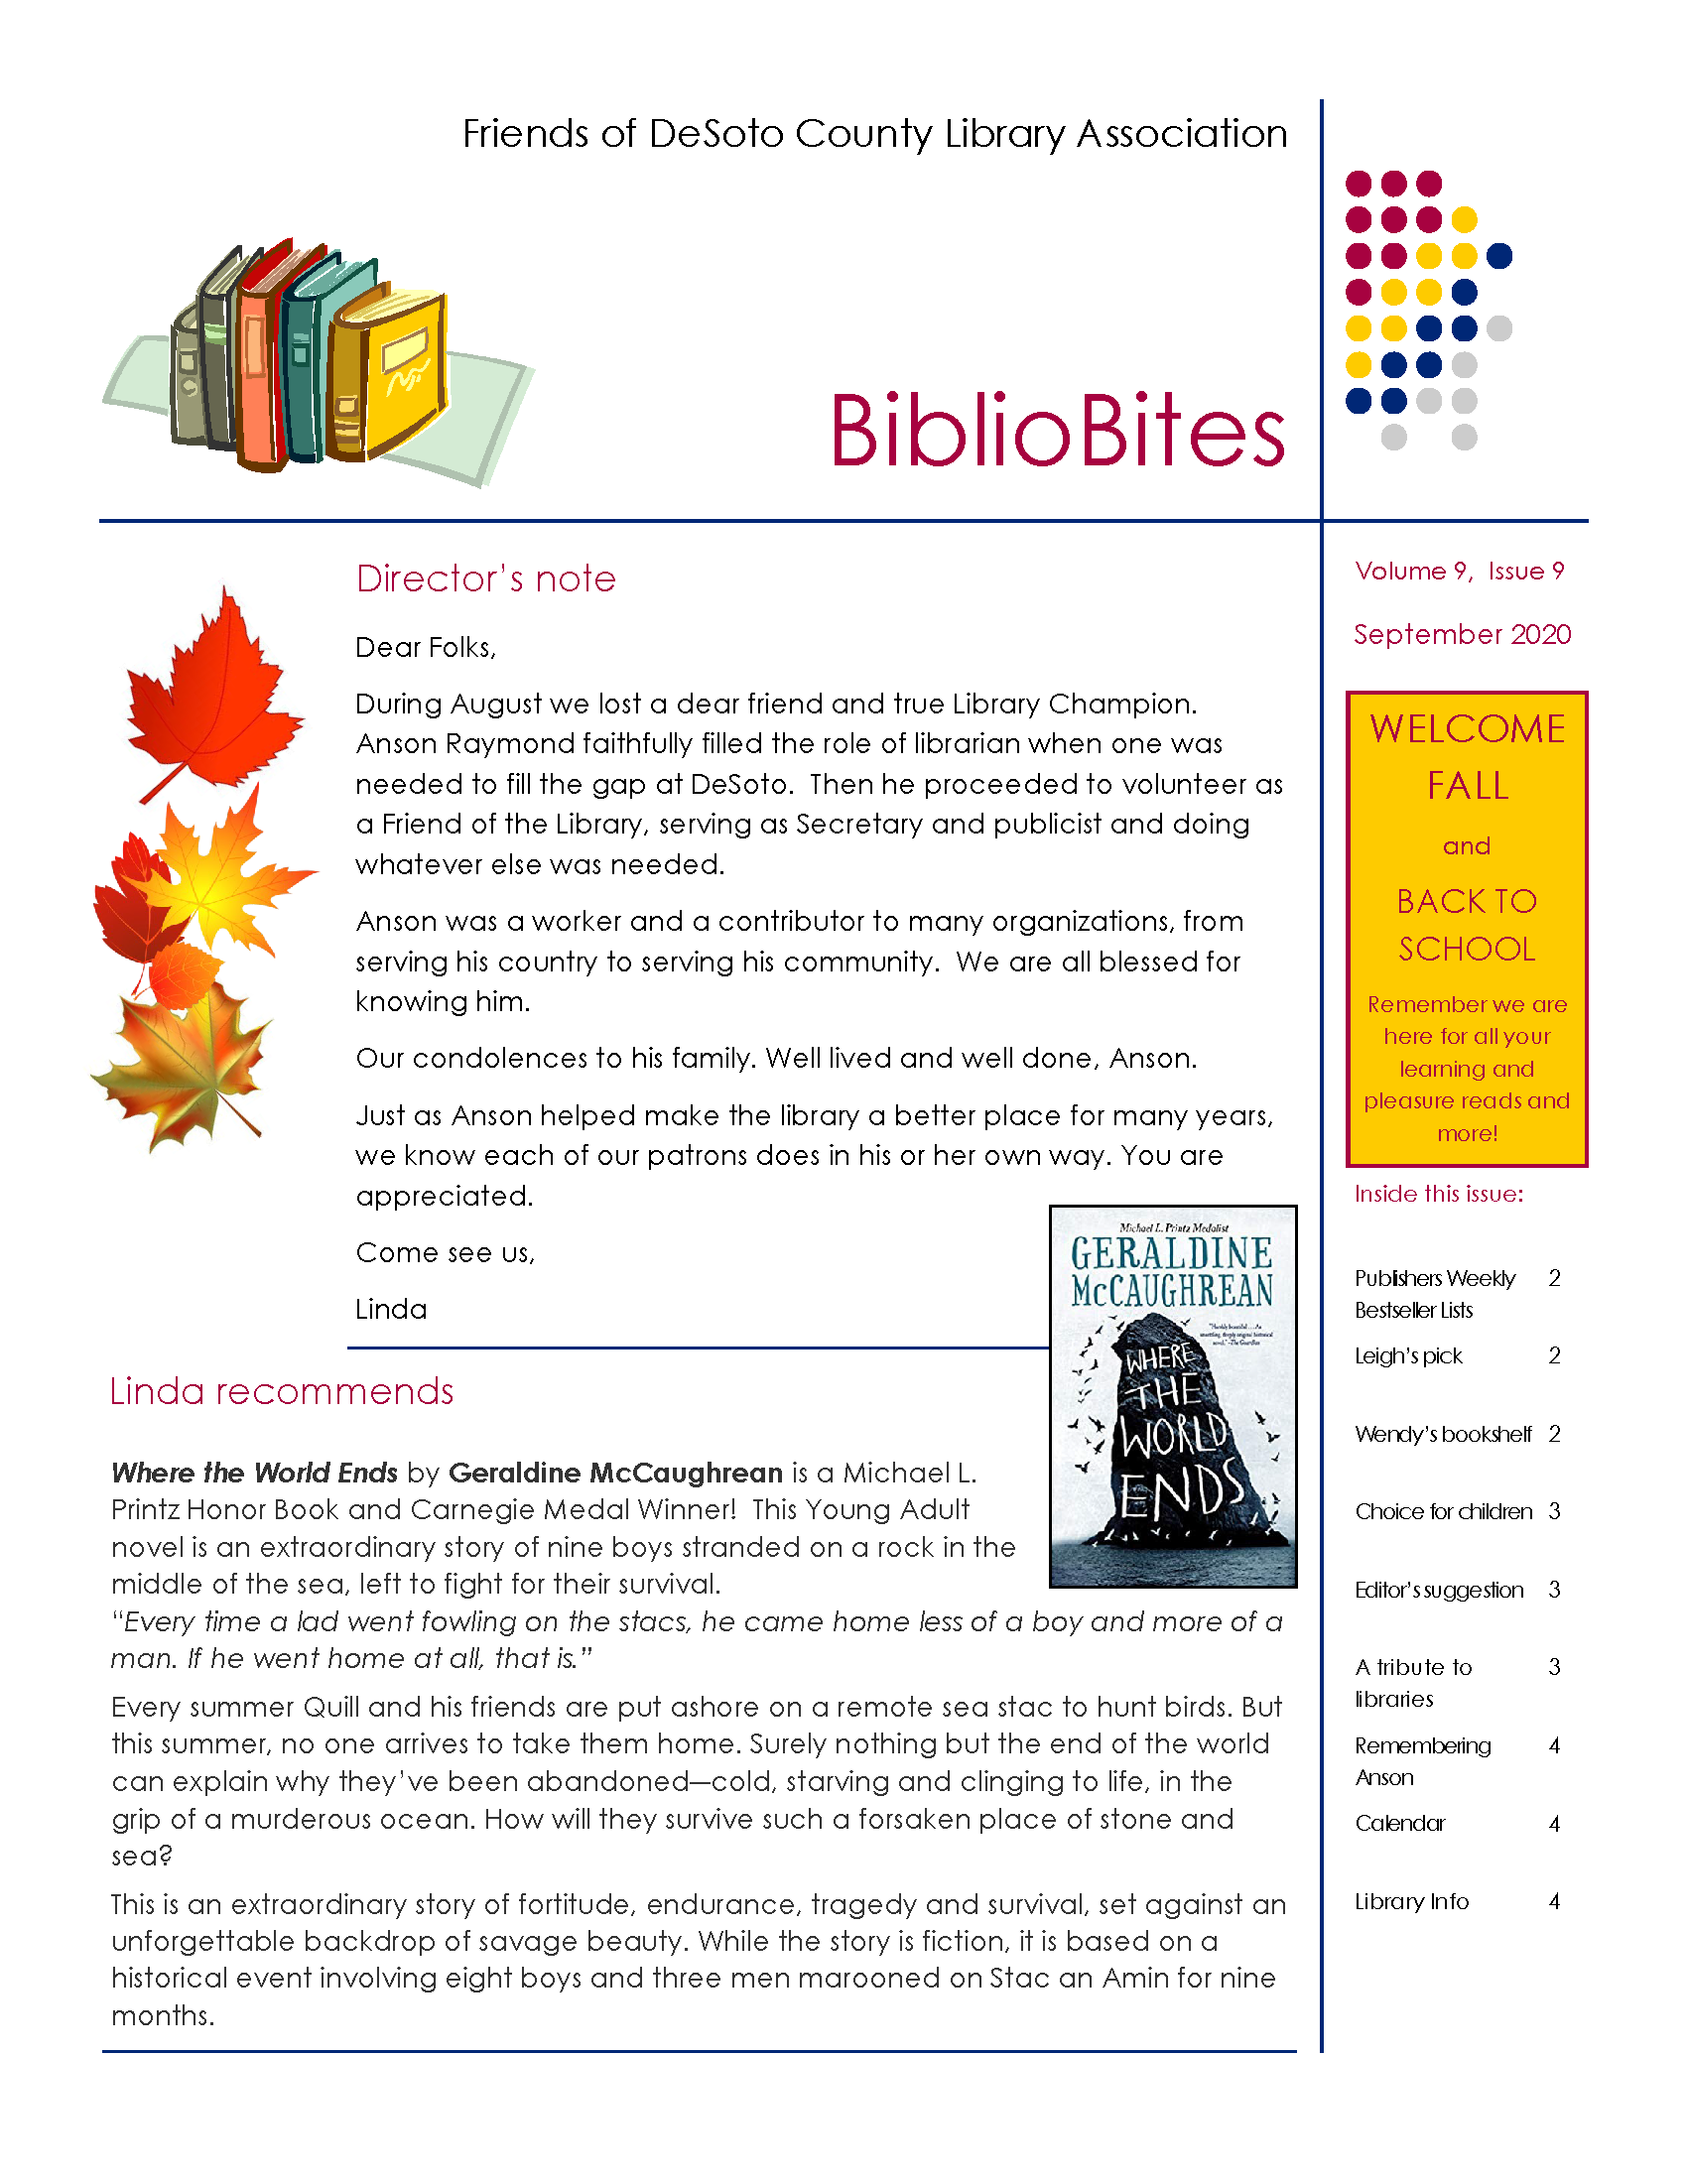 DeSoto COunt Library September 2020 Newsletter